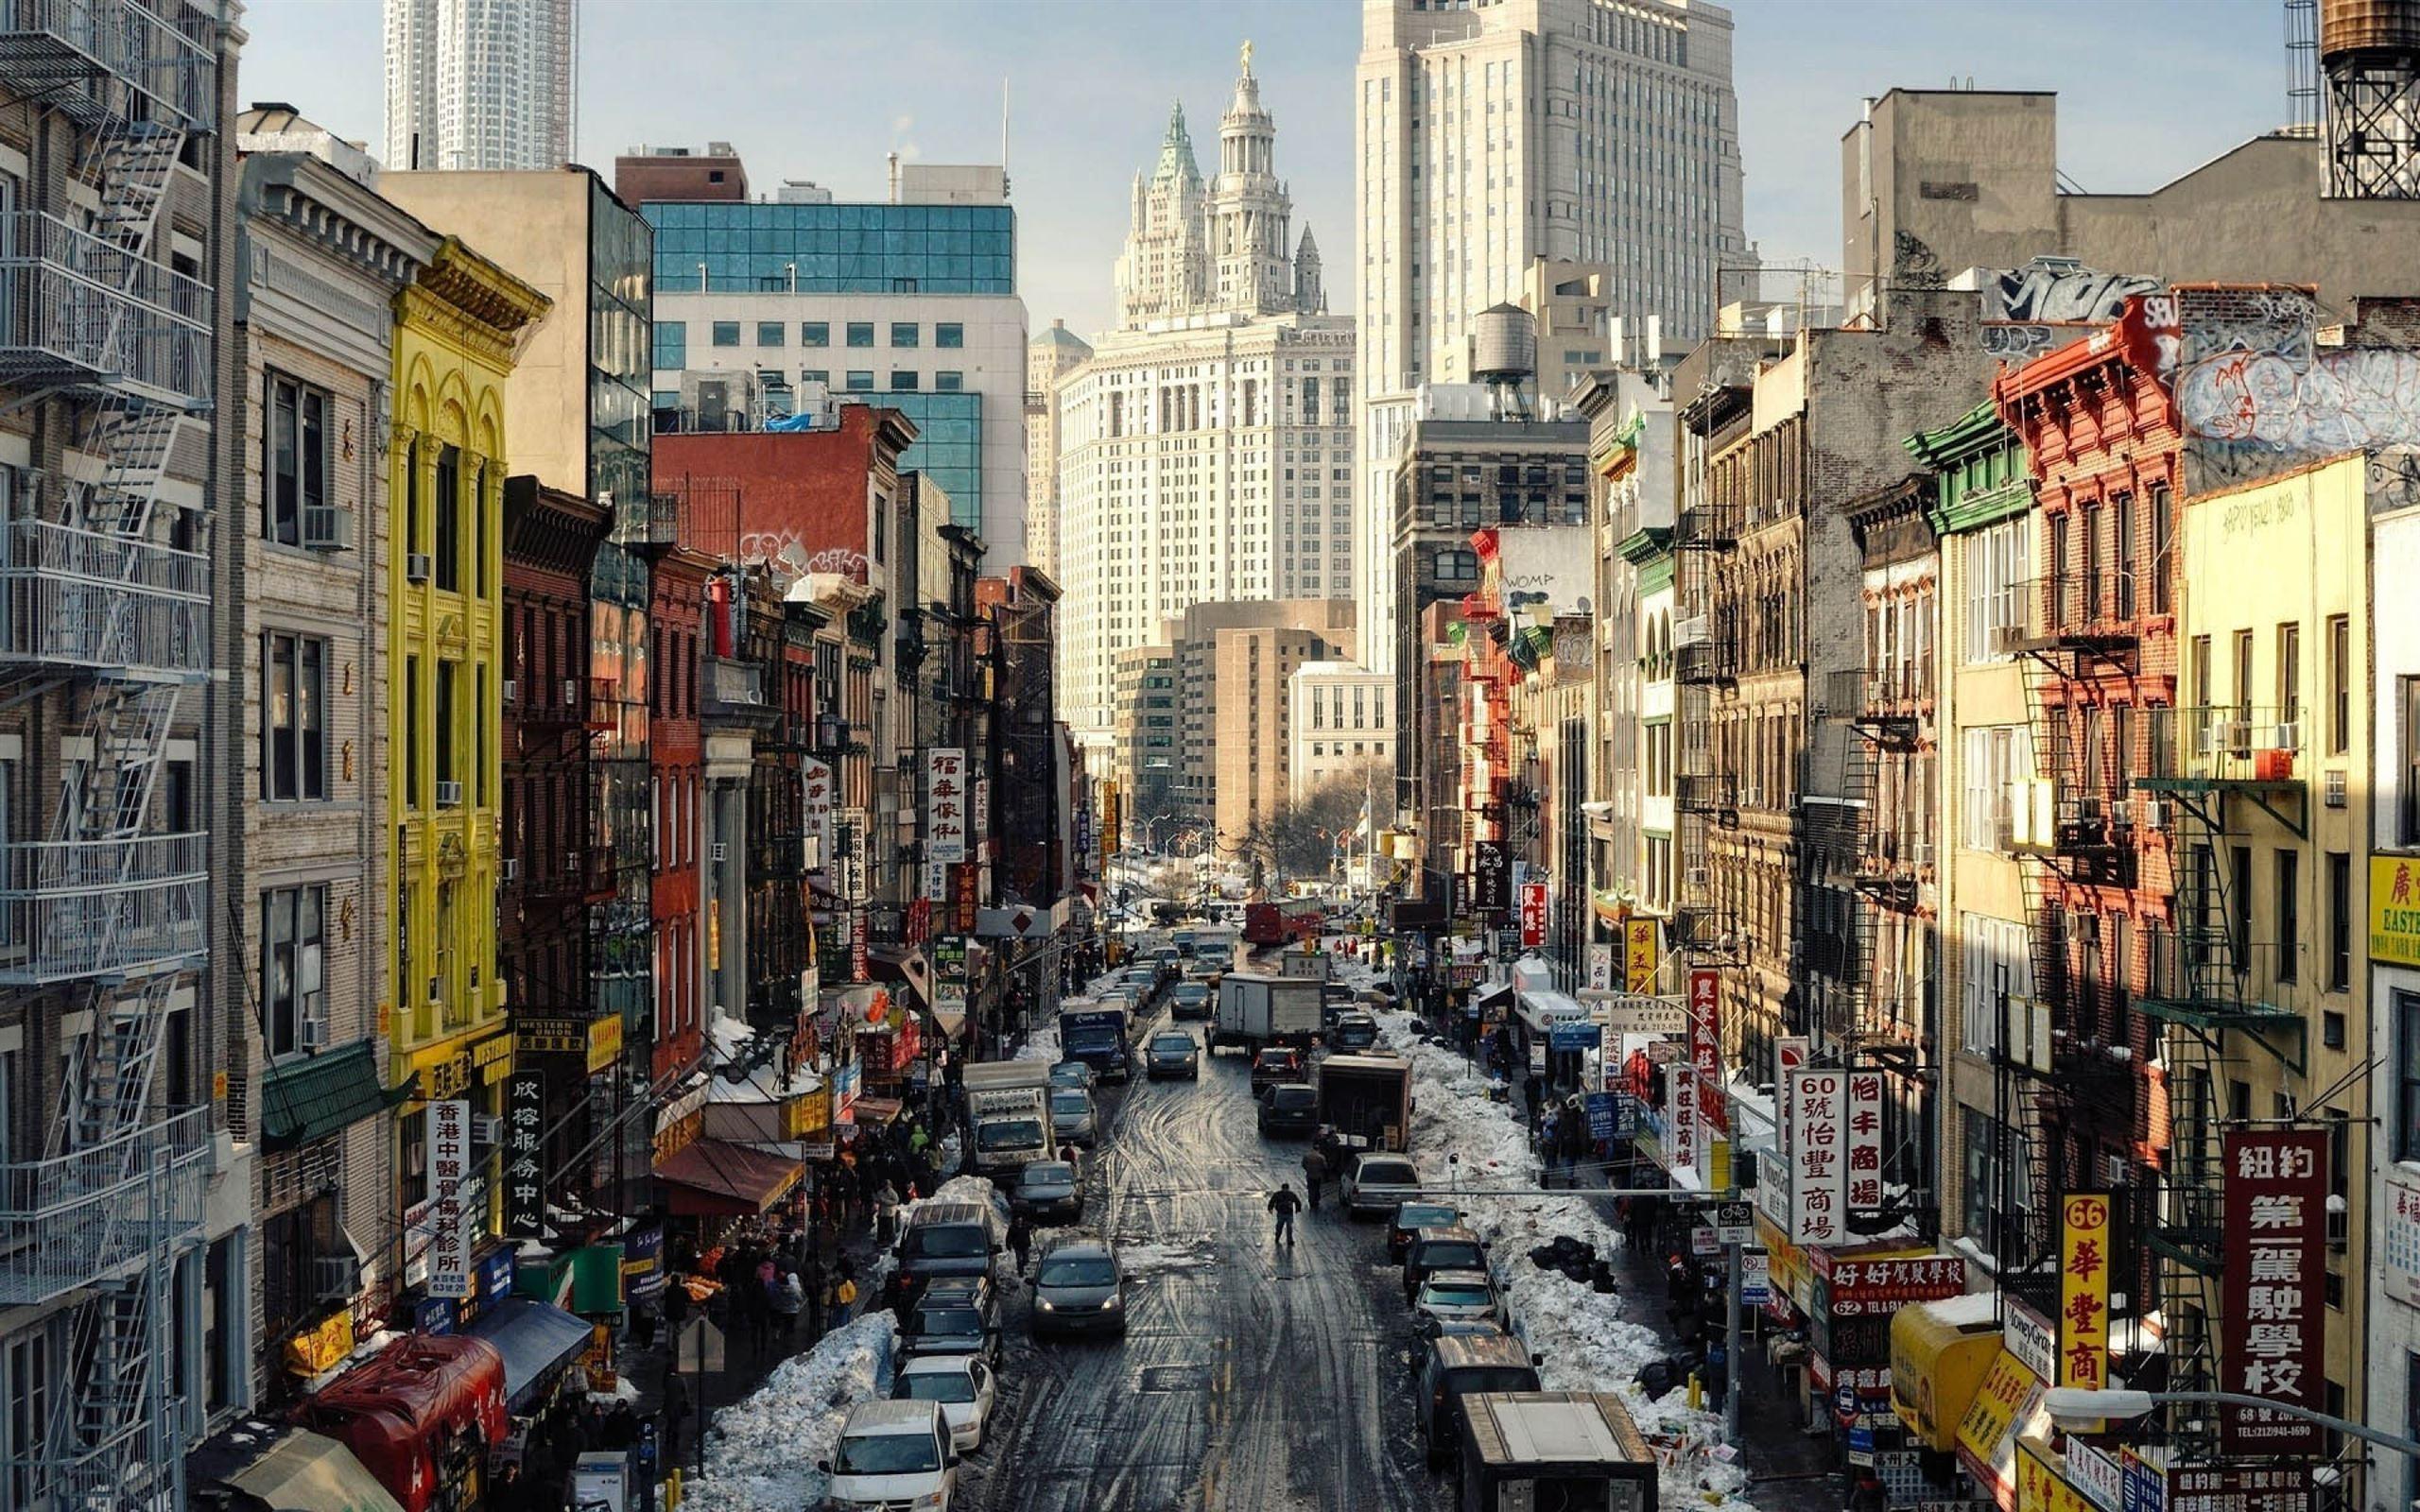 New York Street NY USA Mac Wallpaper Download | Free Mac ...